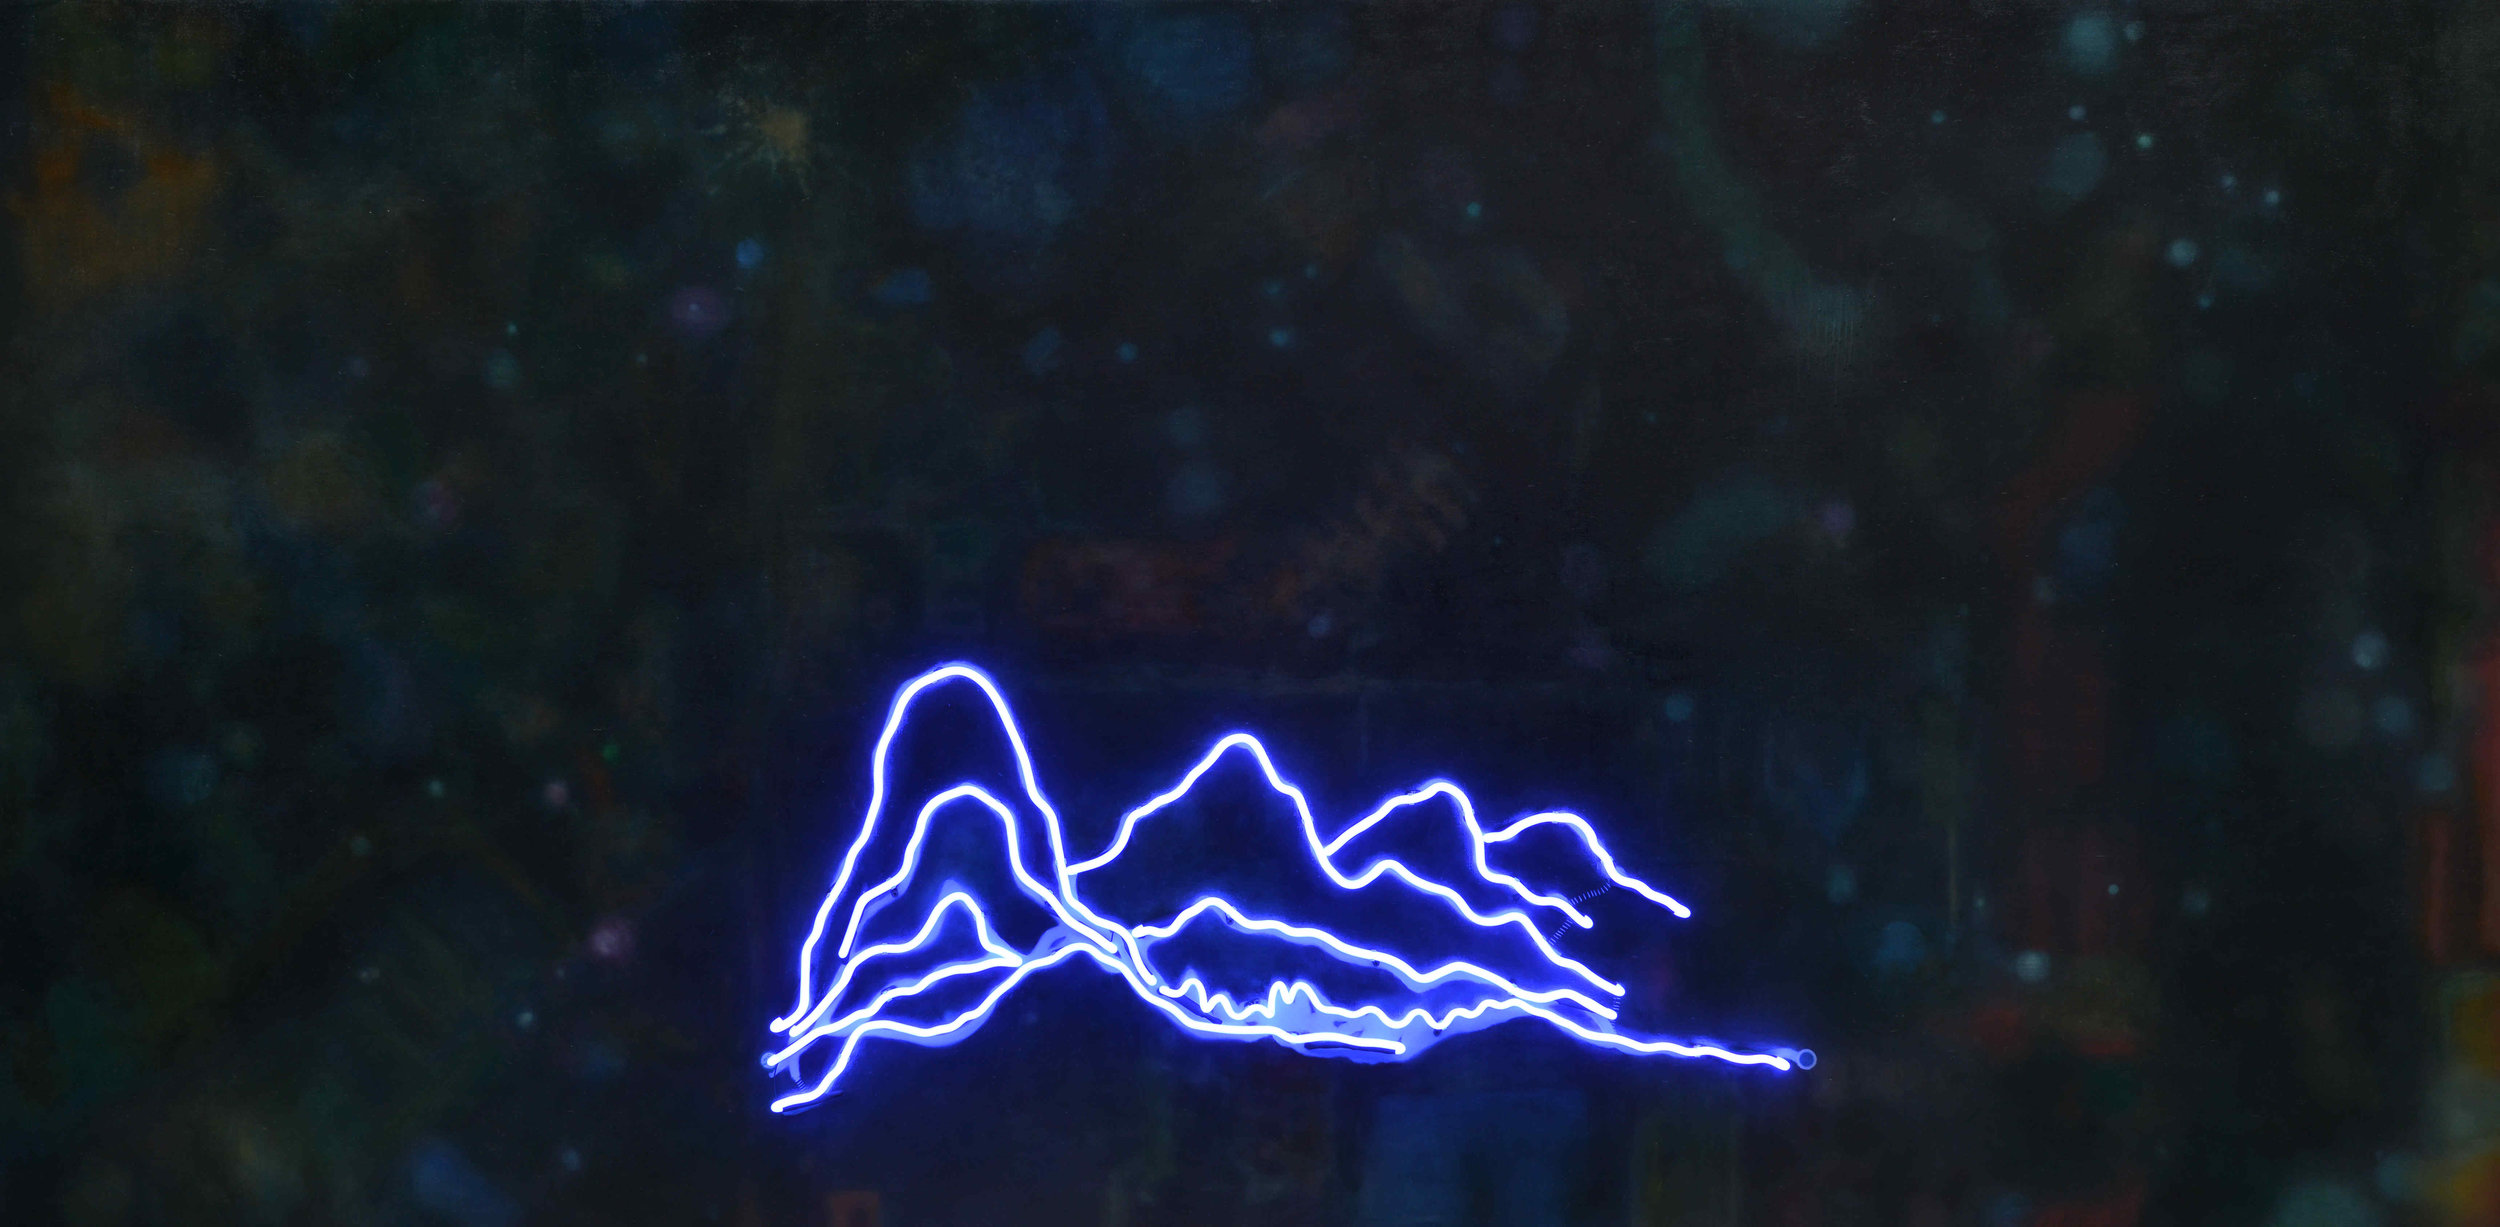 行走 No9霓虹灯、油画和综合材料于帆布Walking  No 9 Neon, oil and Mixed Medium on Canvas_副本.jpg